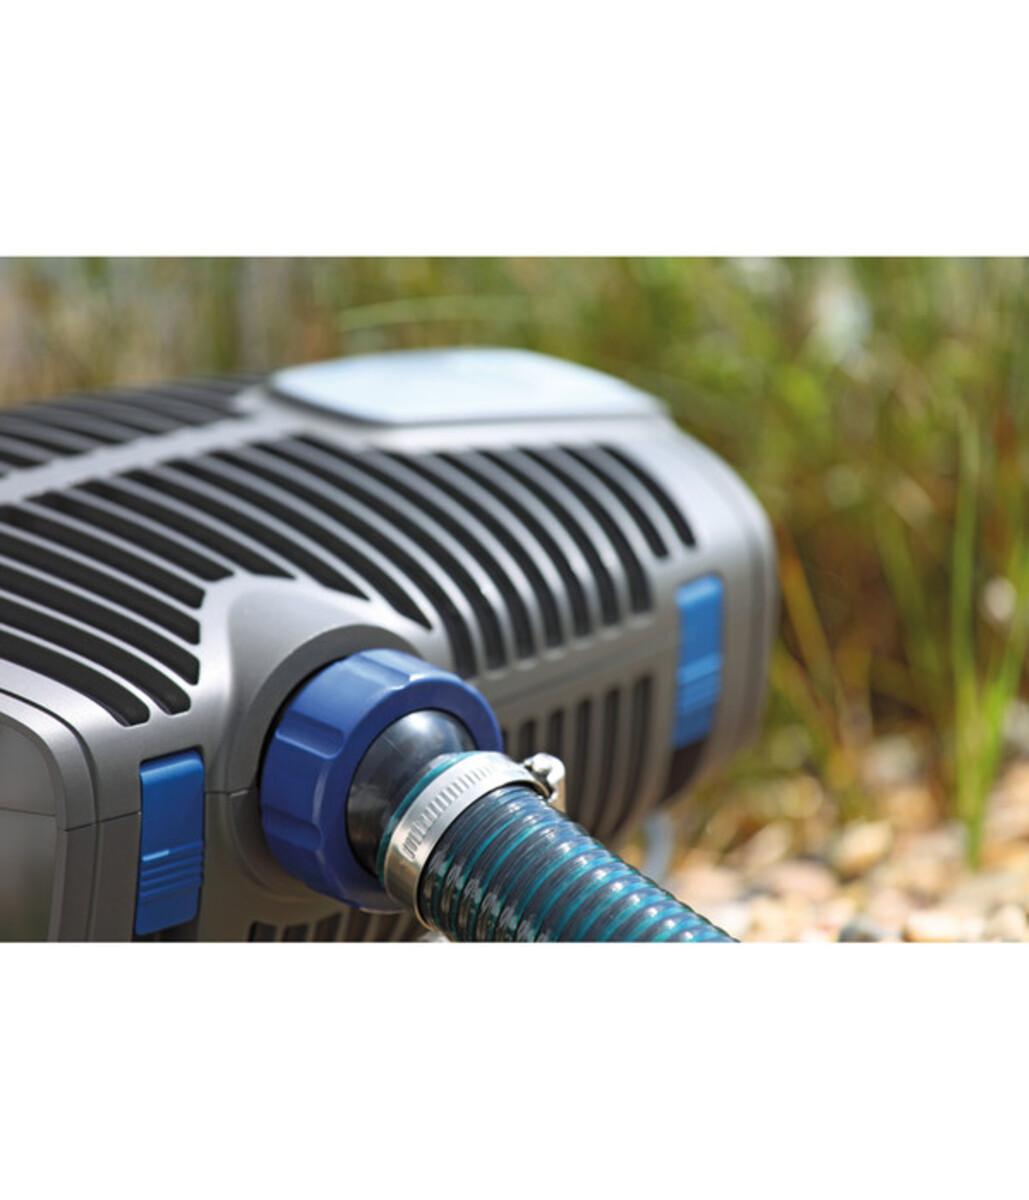 Bild 3 von Oase Bachlaufpumpe AquaMax Eco Premium 6000/12 V